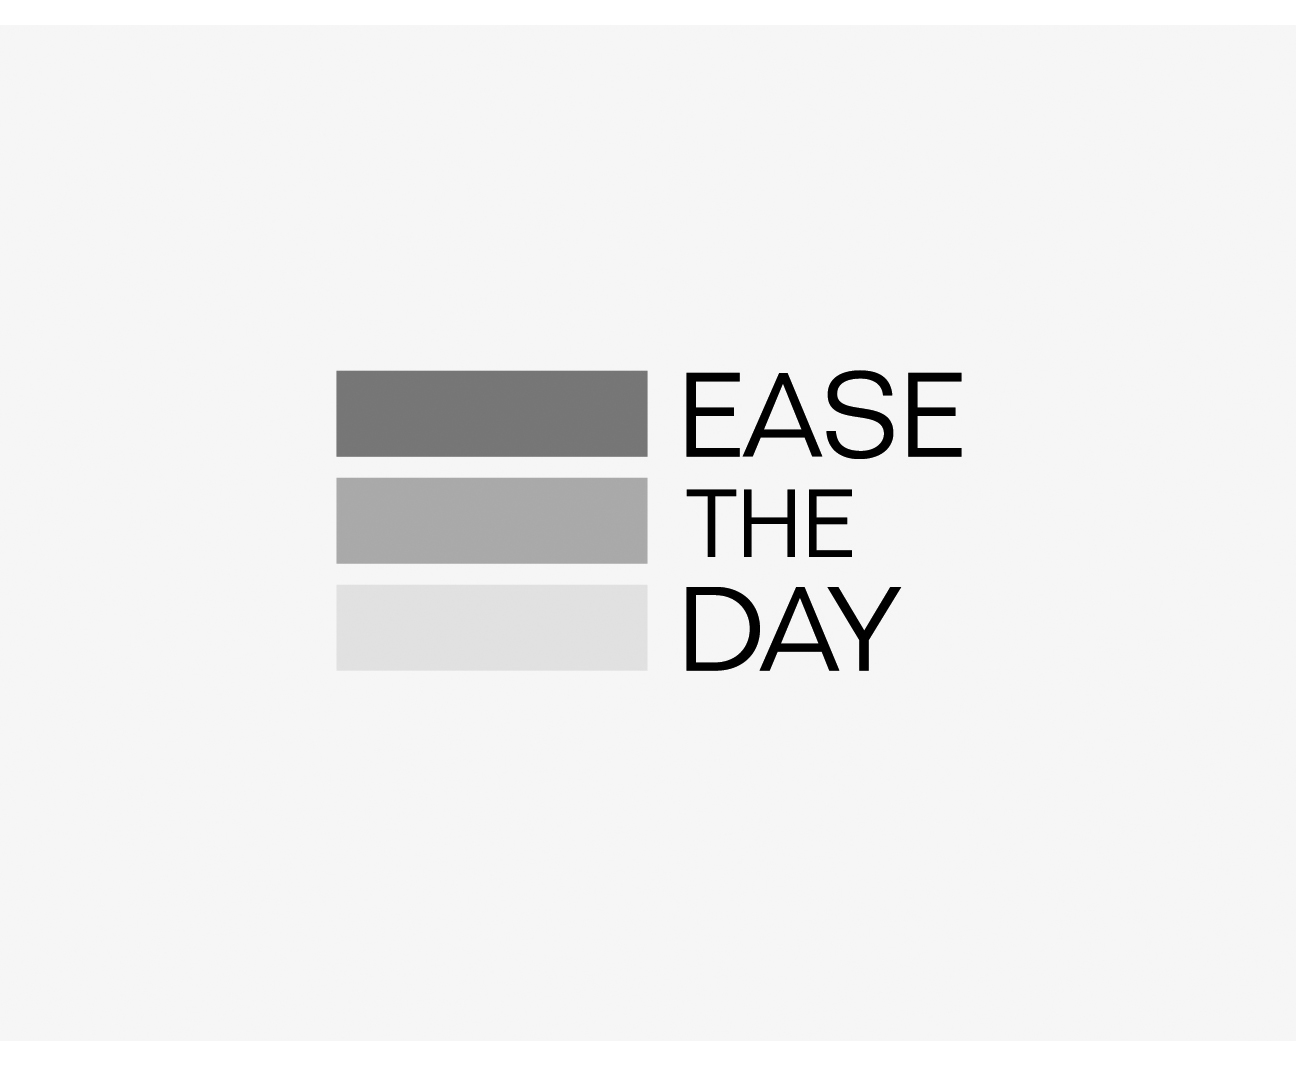 logo_easetheday_gs.jpg